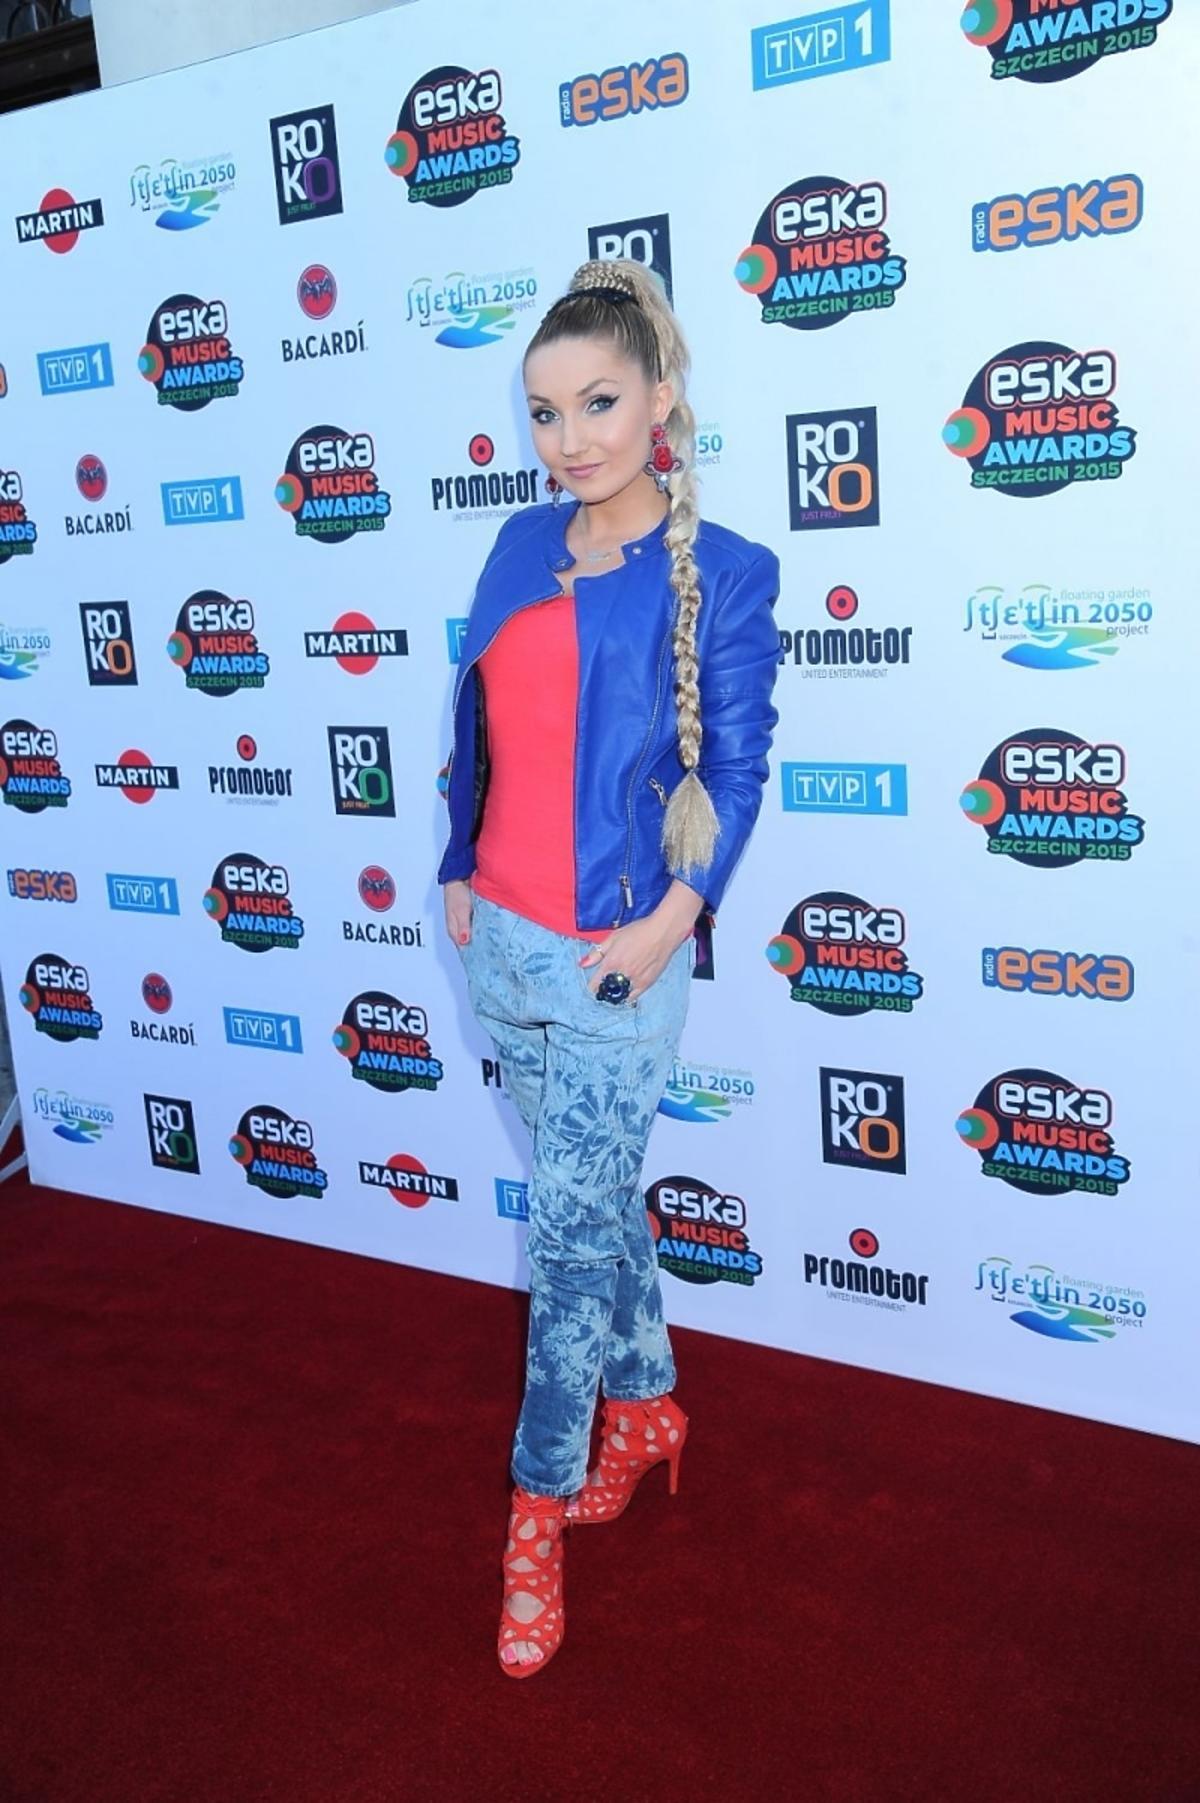 Cleo na nominacjach do Eska Music Awards 2015